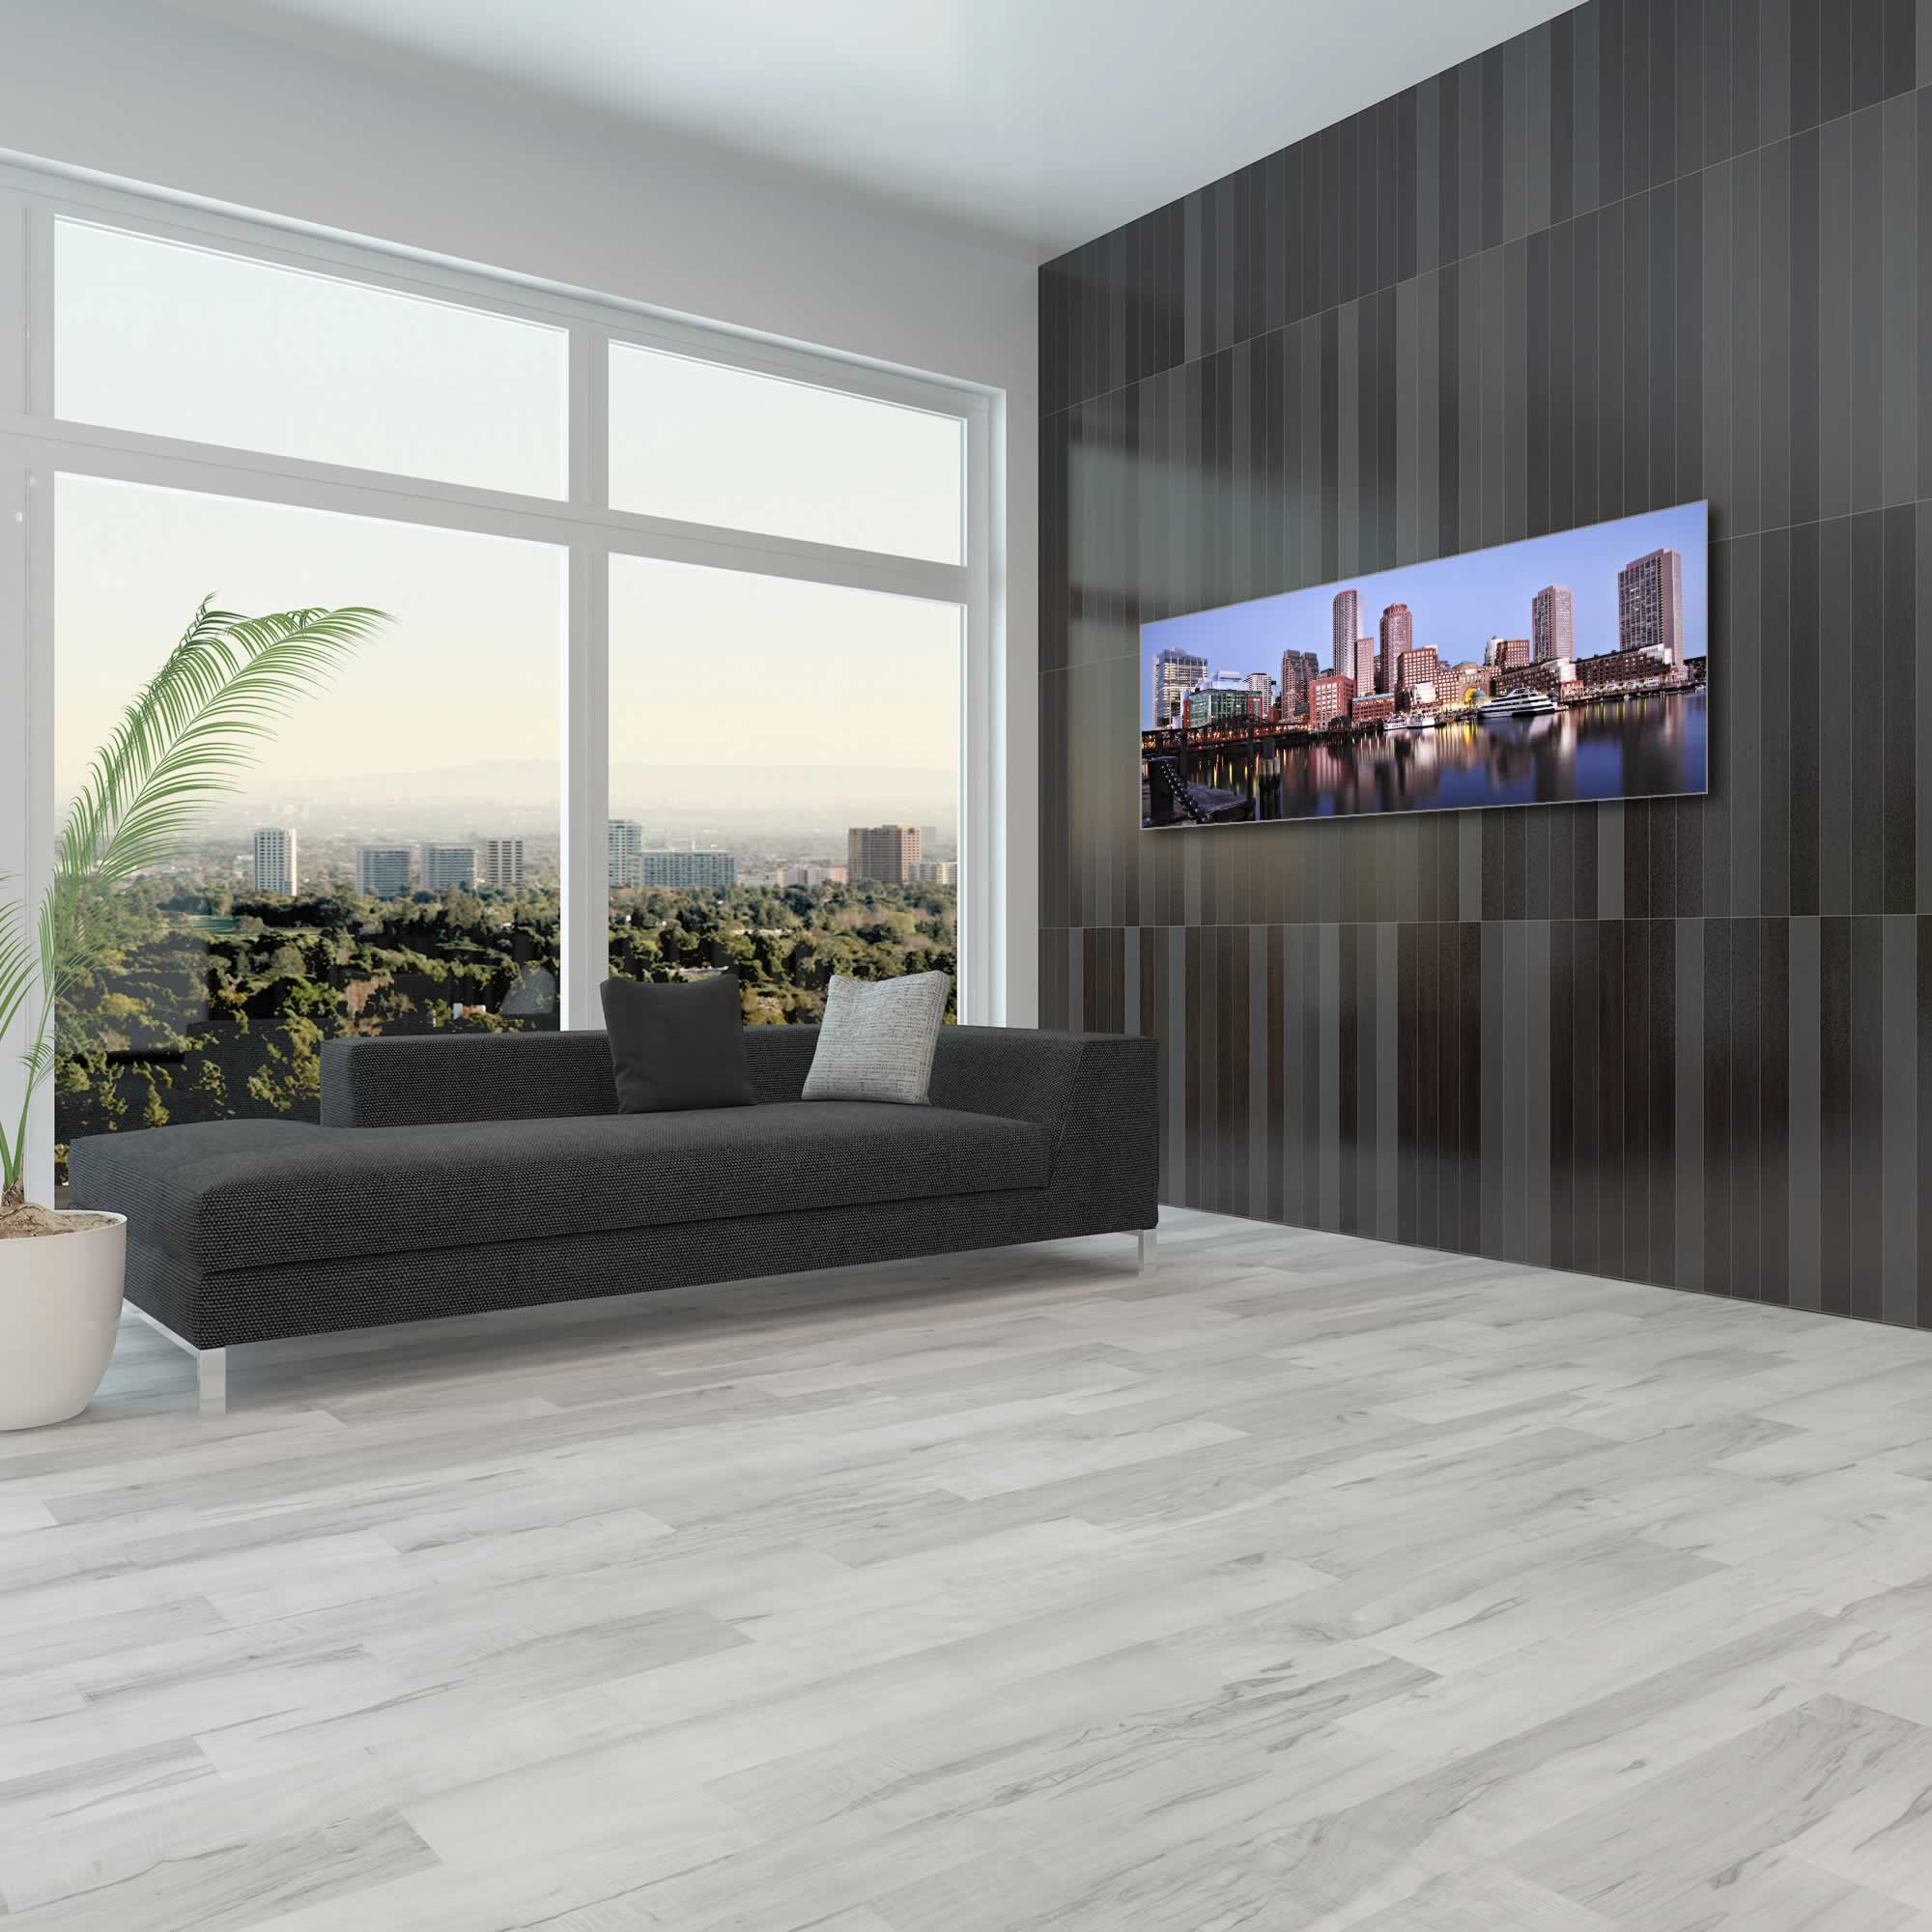 Boston City Skyline - Urban Modern Art, Designer Home Decor, Cityscape Wall Artwork, Trendy Contemporary Art - Alternate View 1